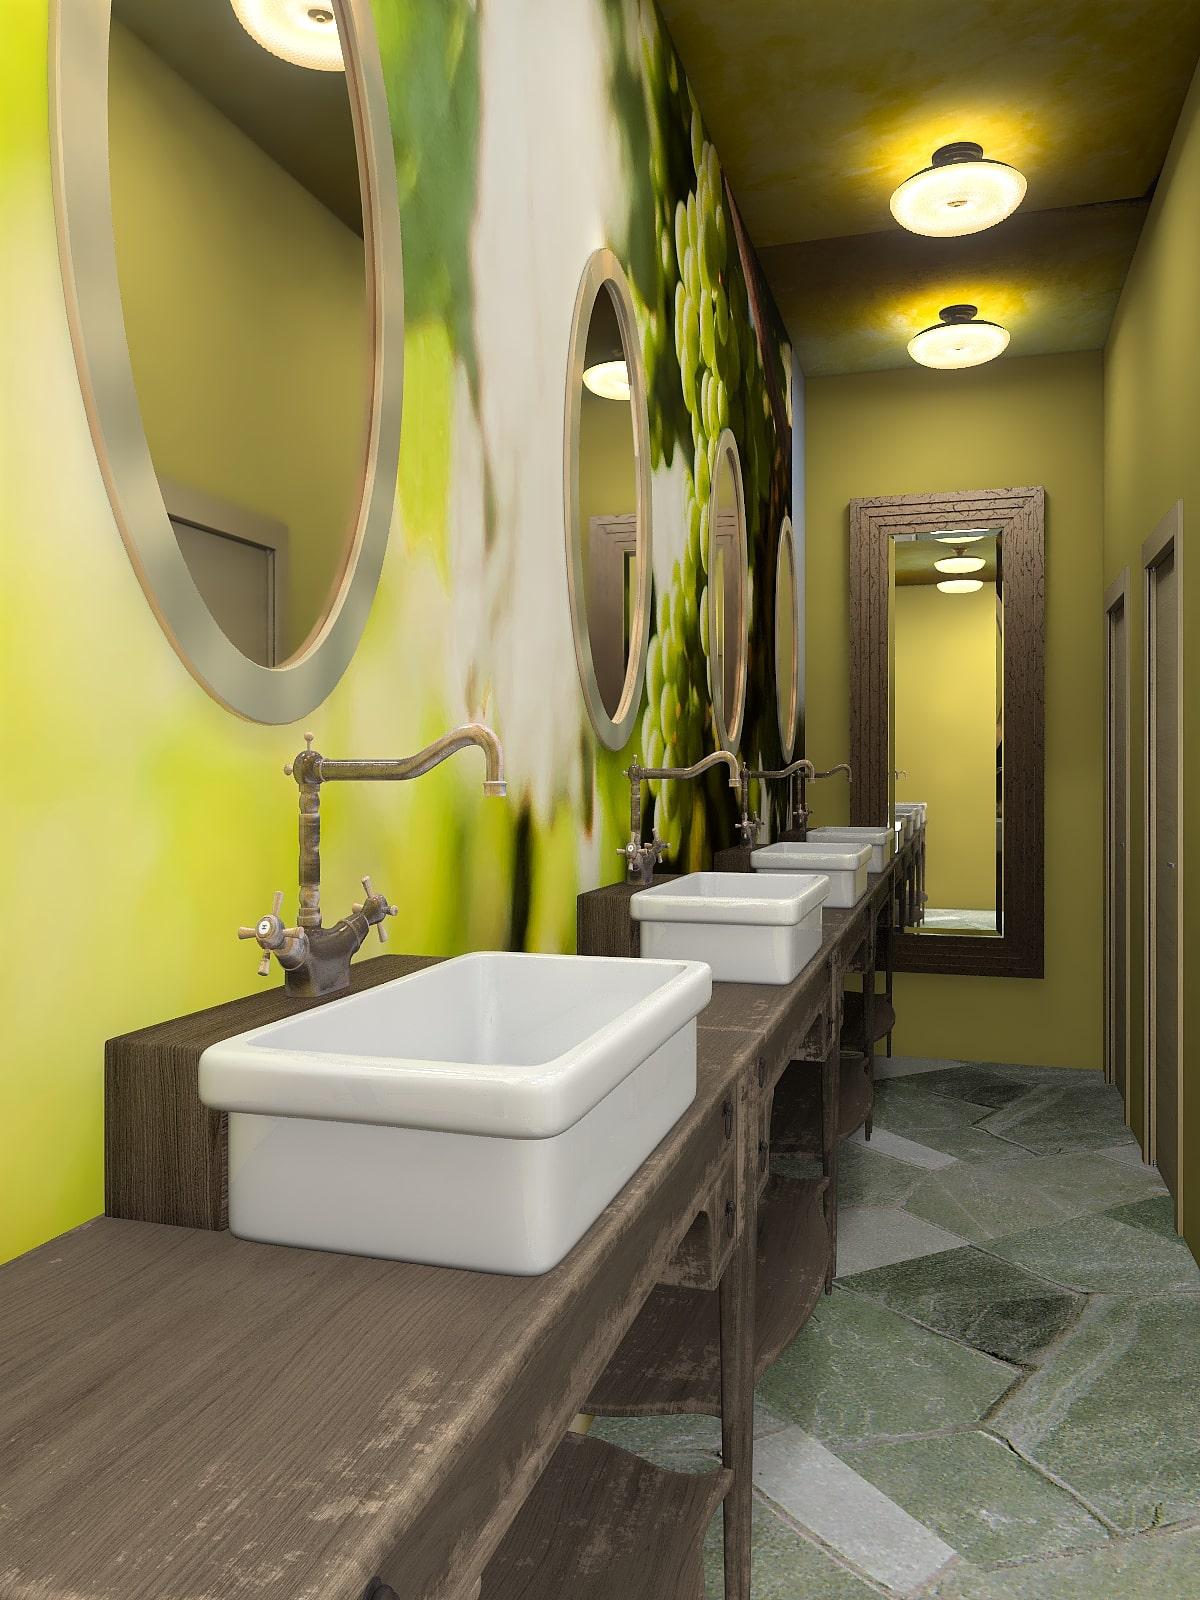 Restaurant toilets interior